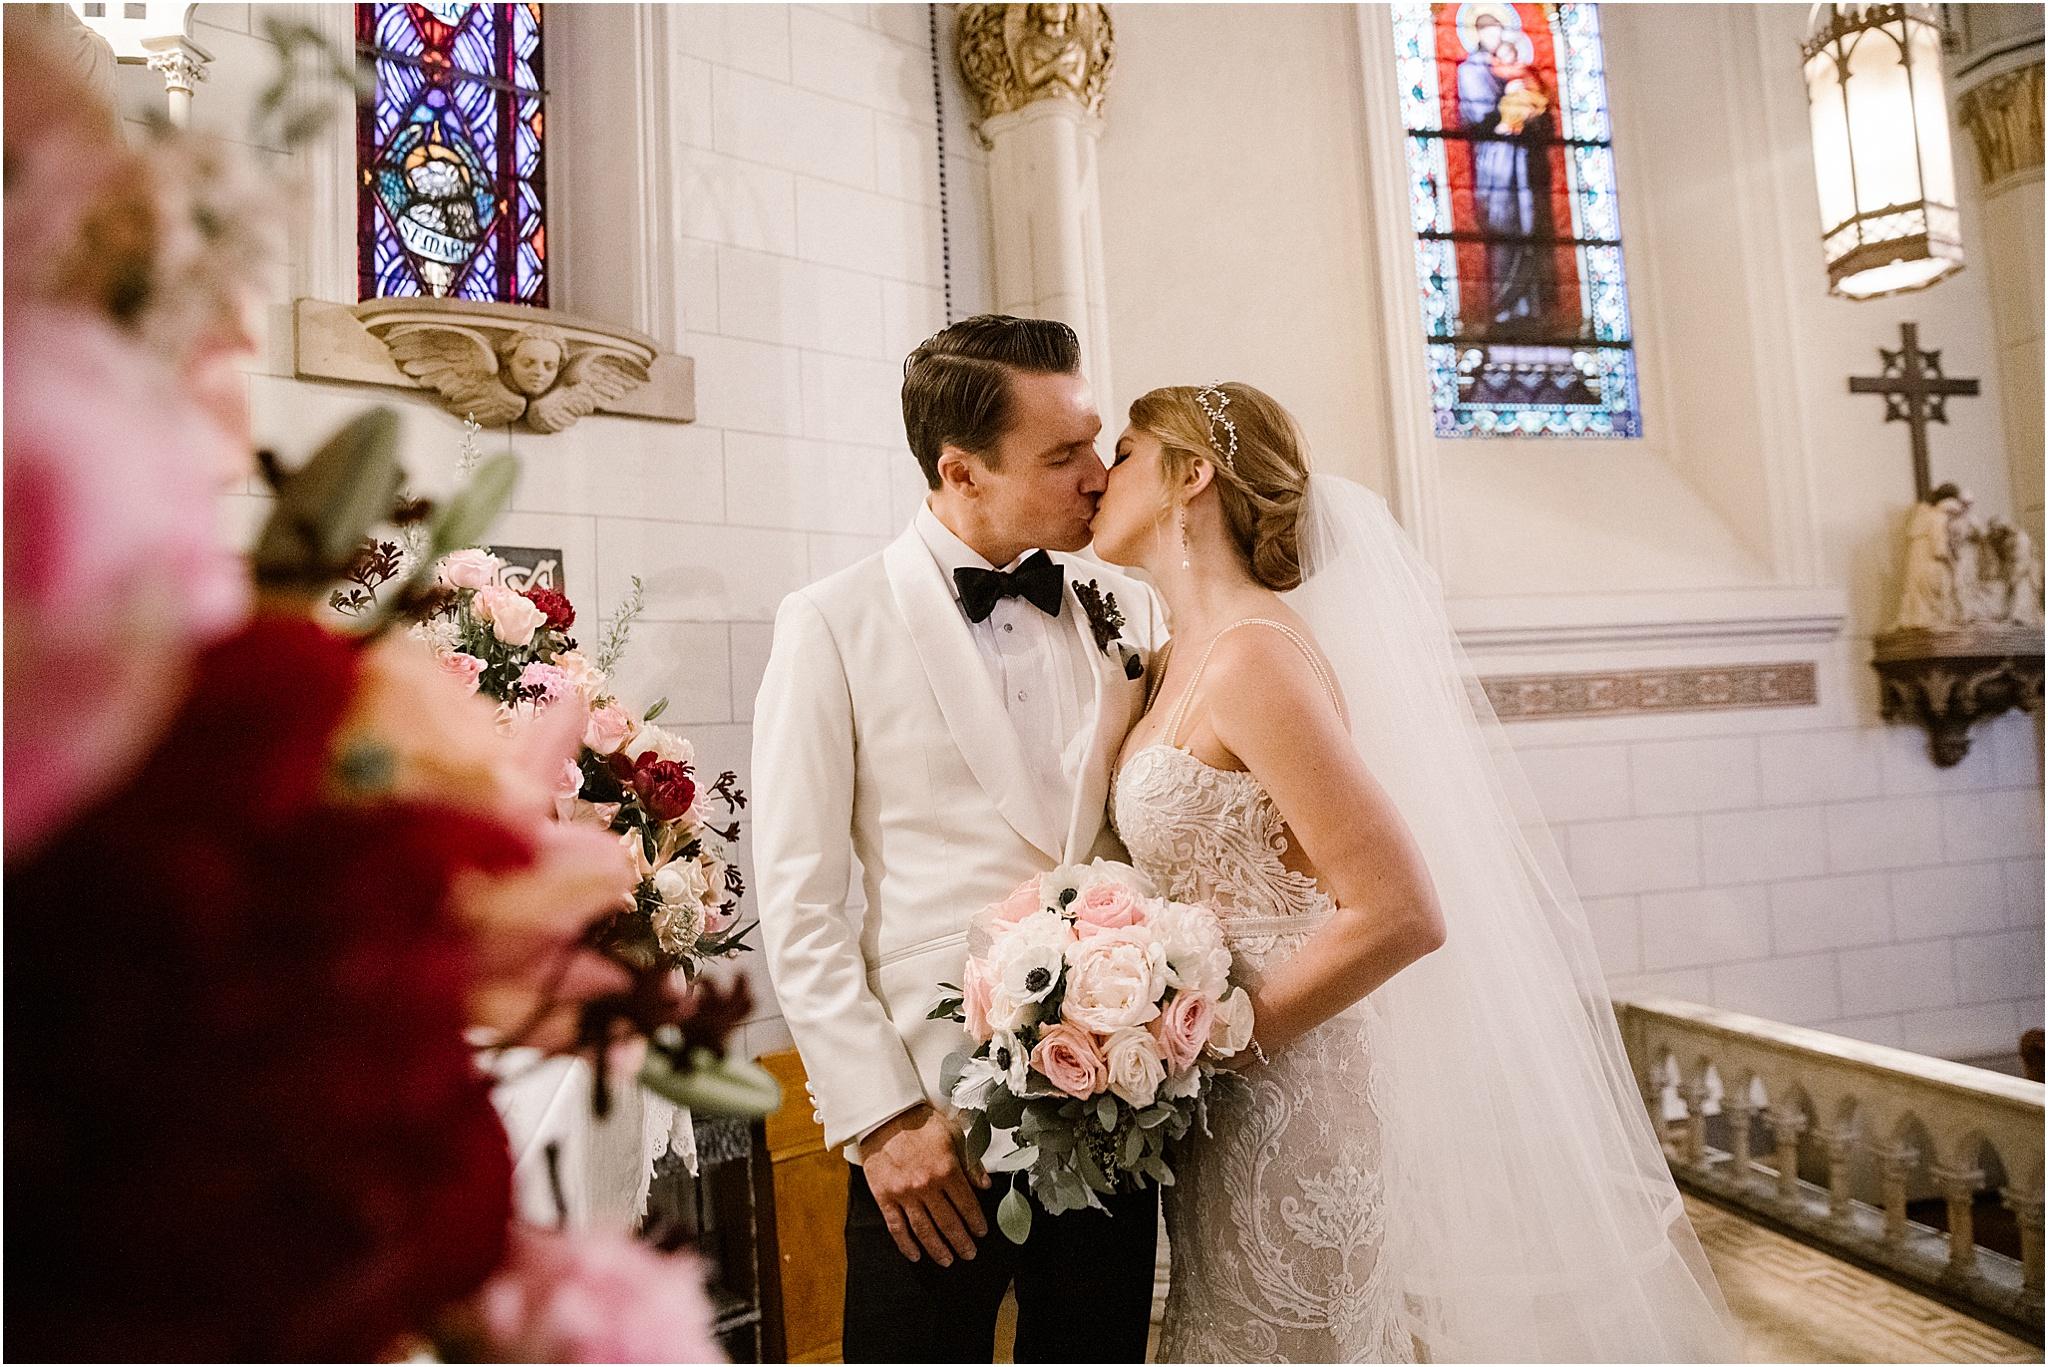 BLUE ROSE PHOTOGRAPHY SANTA FE WEDDING_27